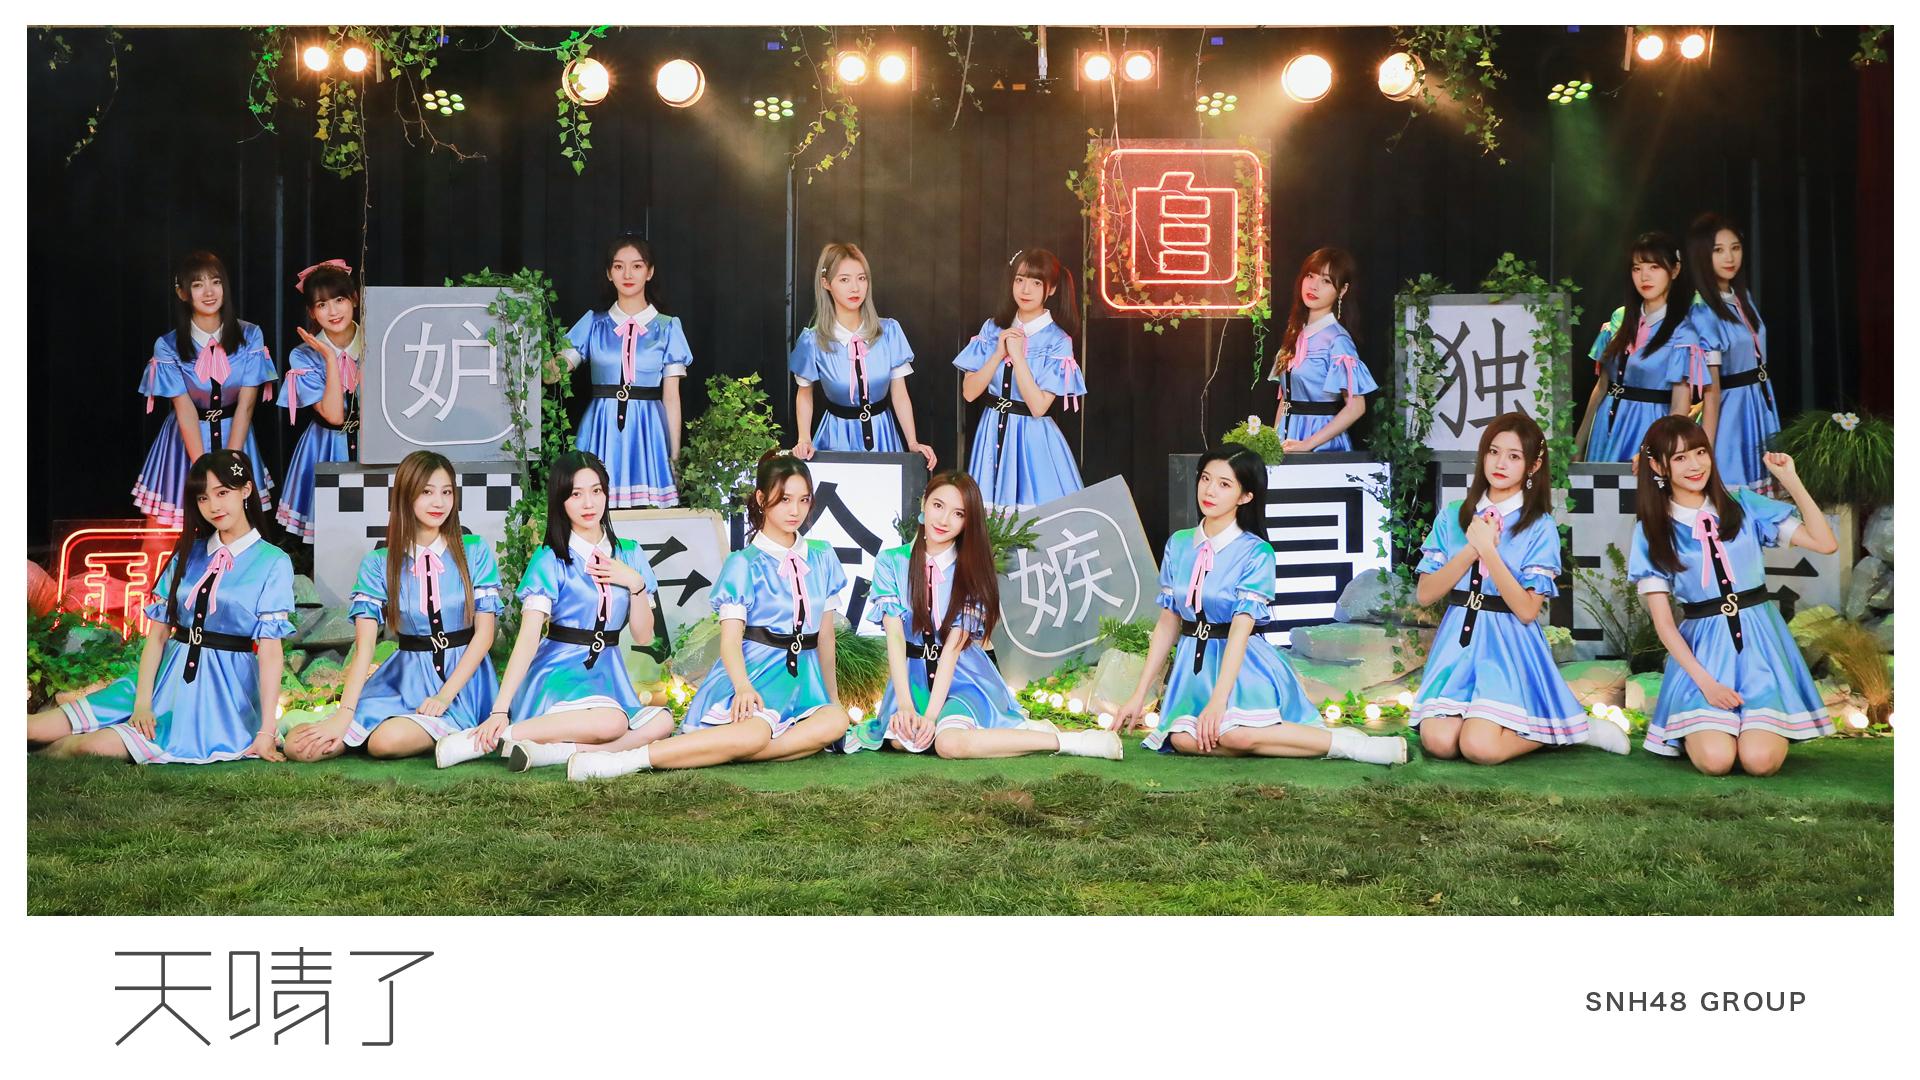 【SNH48 GROUP】第七届偶像年度人气总决选专属应援EP主打曲《天晴了》MV剧场版